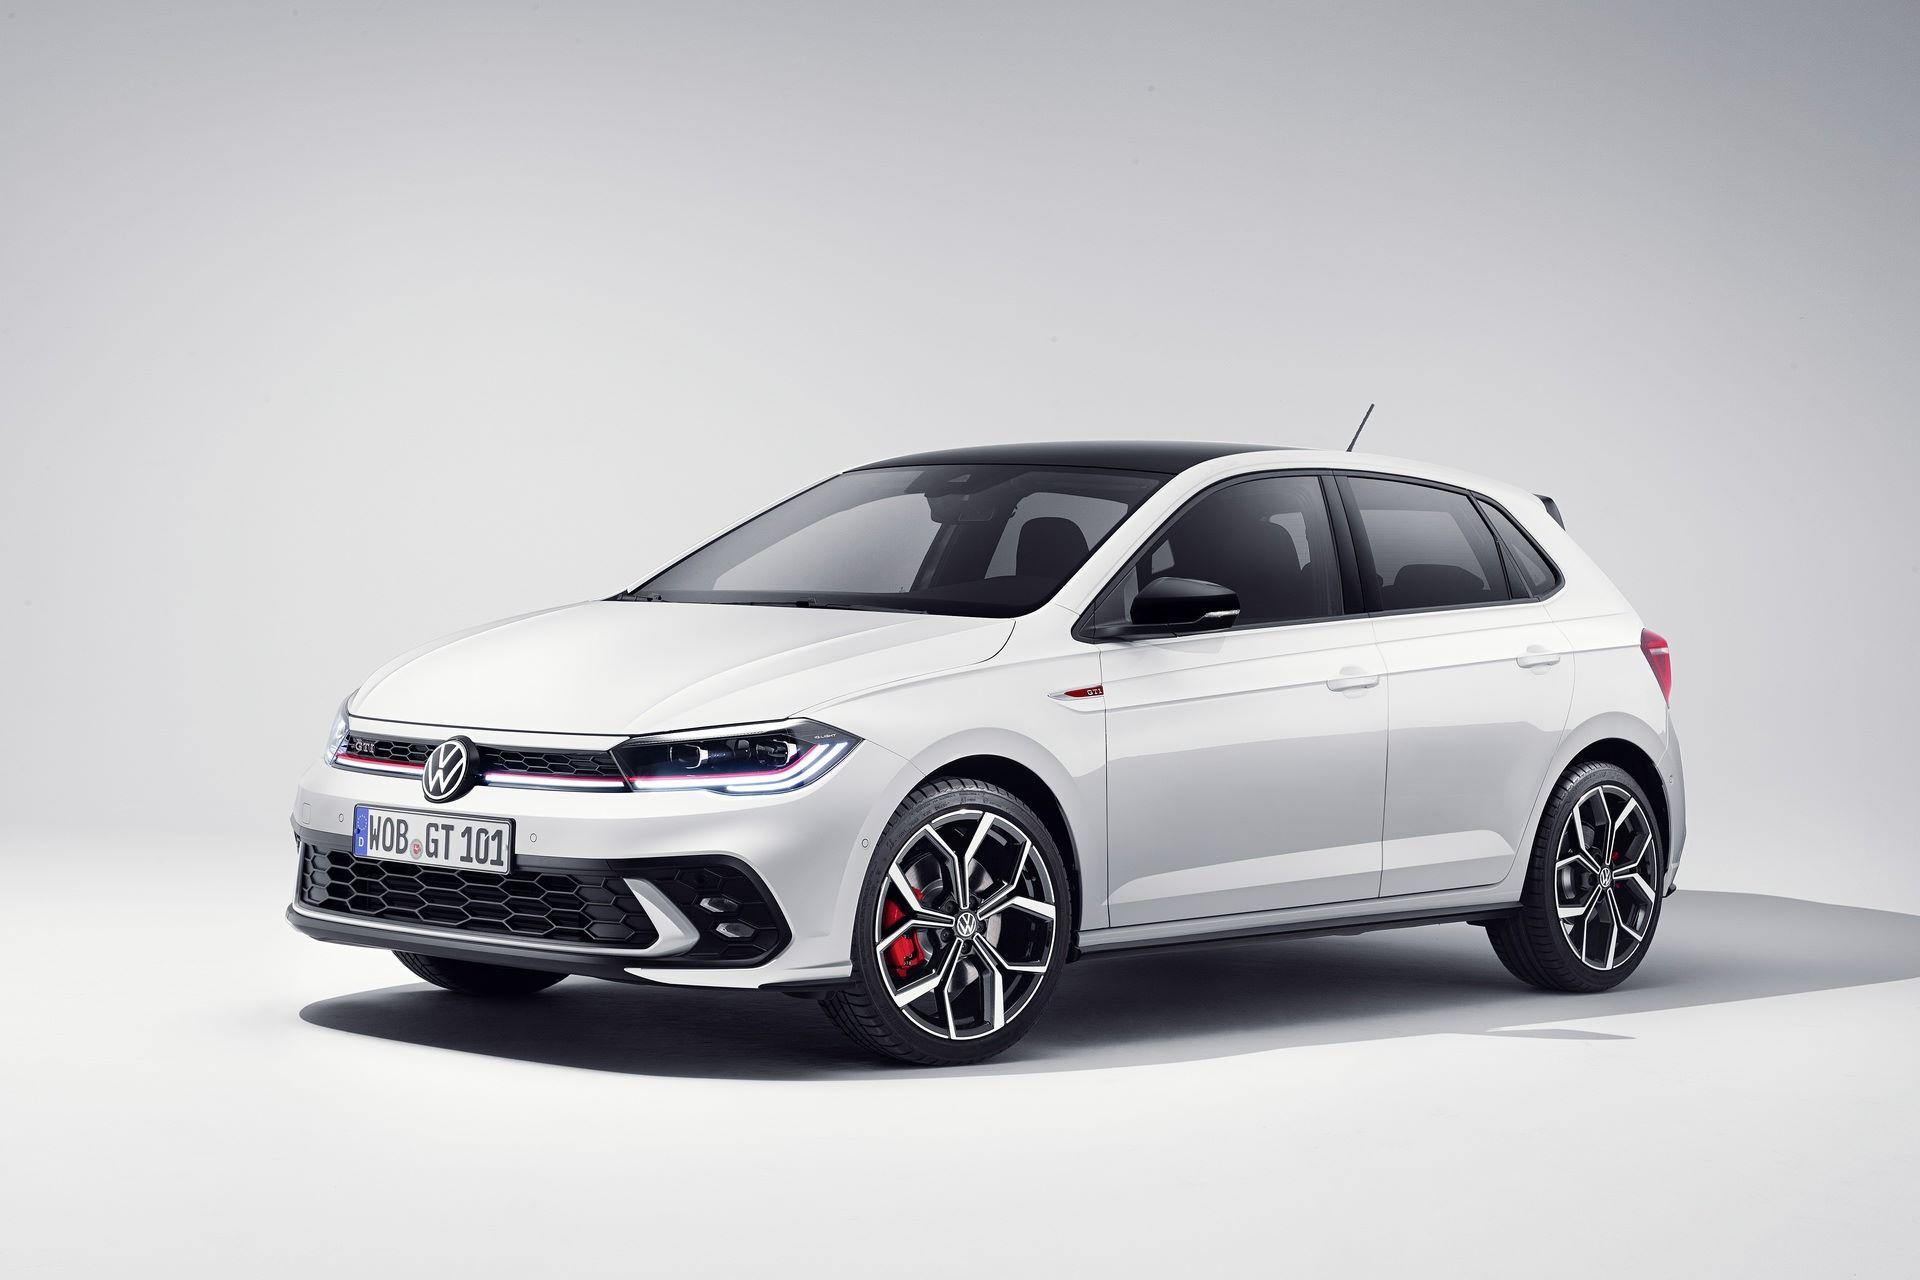 VW-Polo-GTI-facelift-2